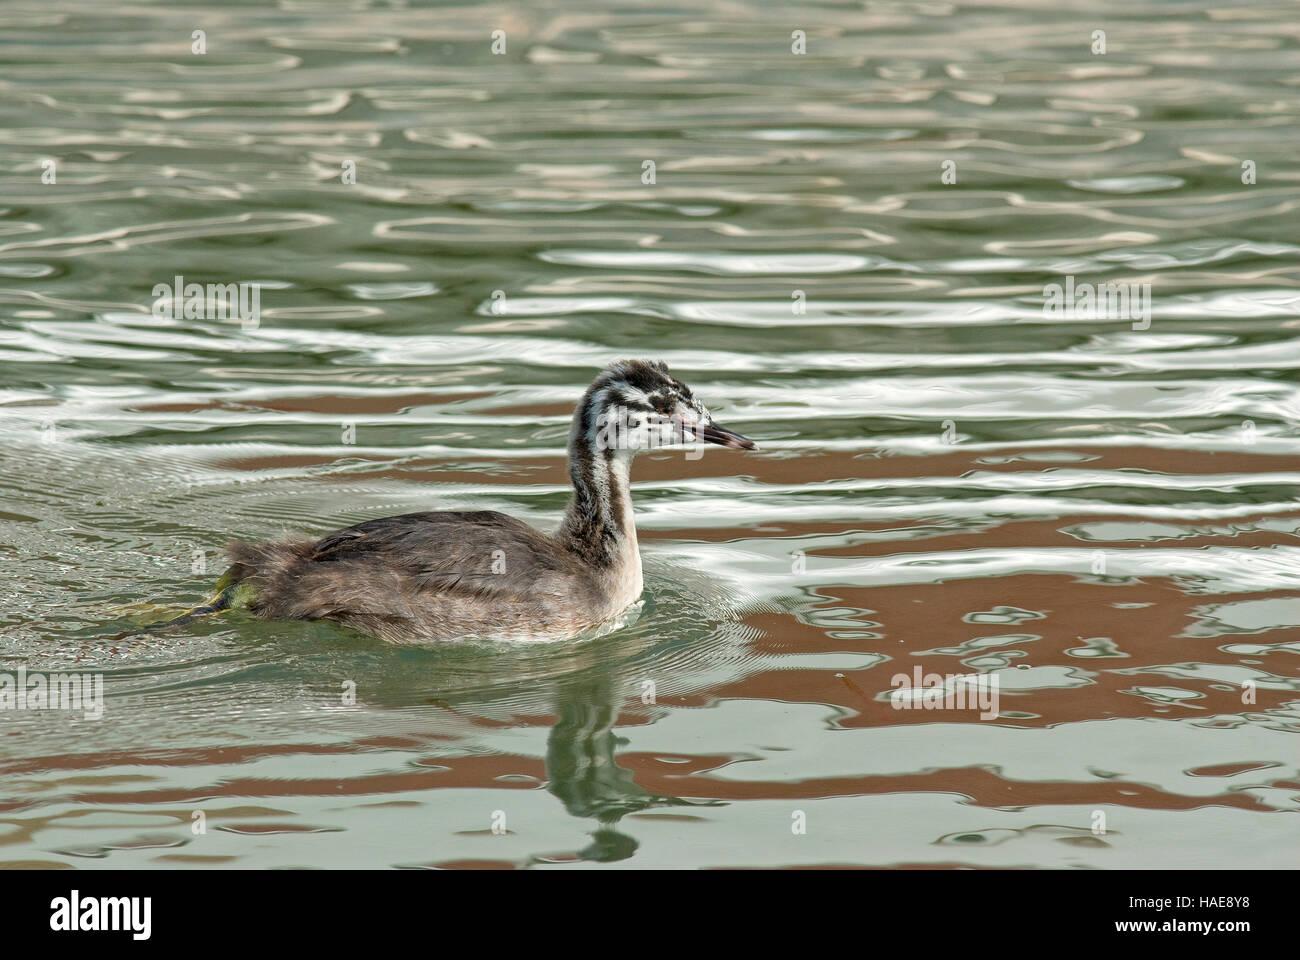 Young great crested grebe (Podiceps cristatus), Lake Trasimeno, Umbria, Italy - Stock Image